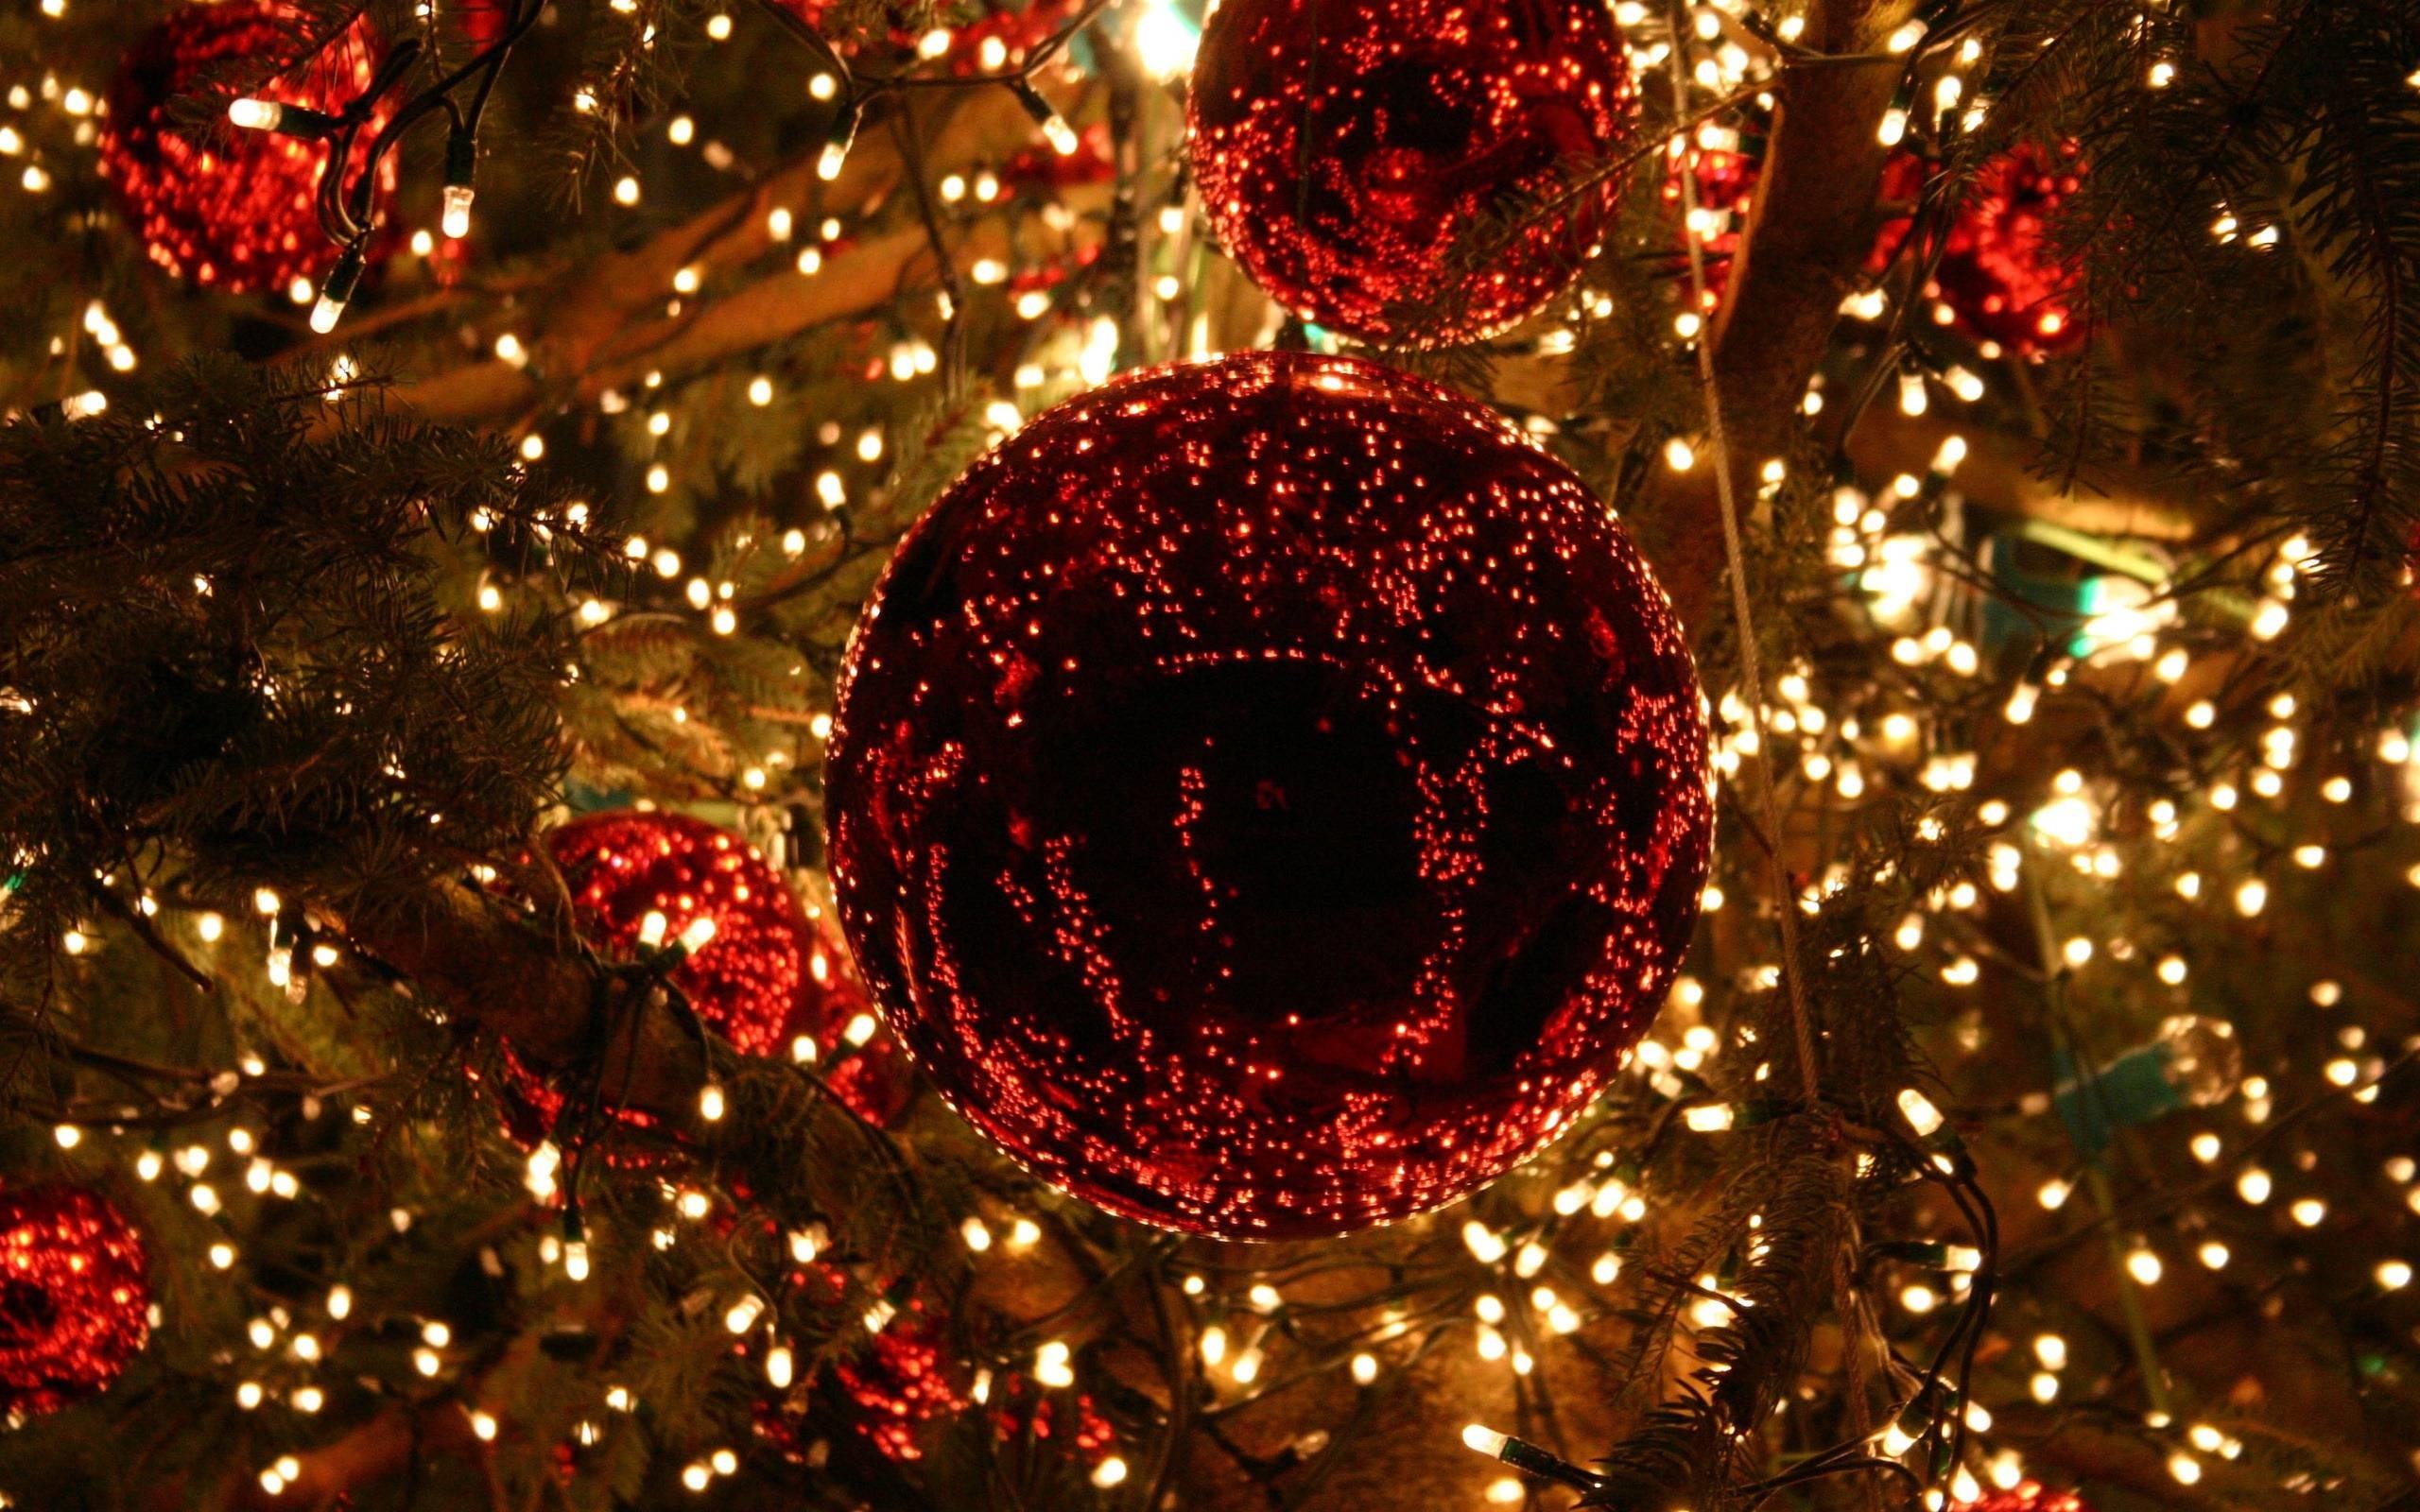 Christmas Lights Background HD wallpaper – HD Wallpapers